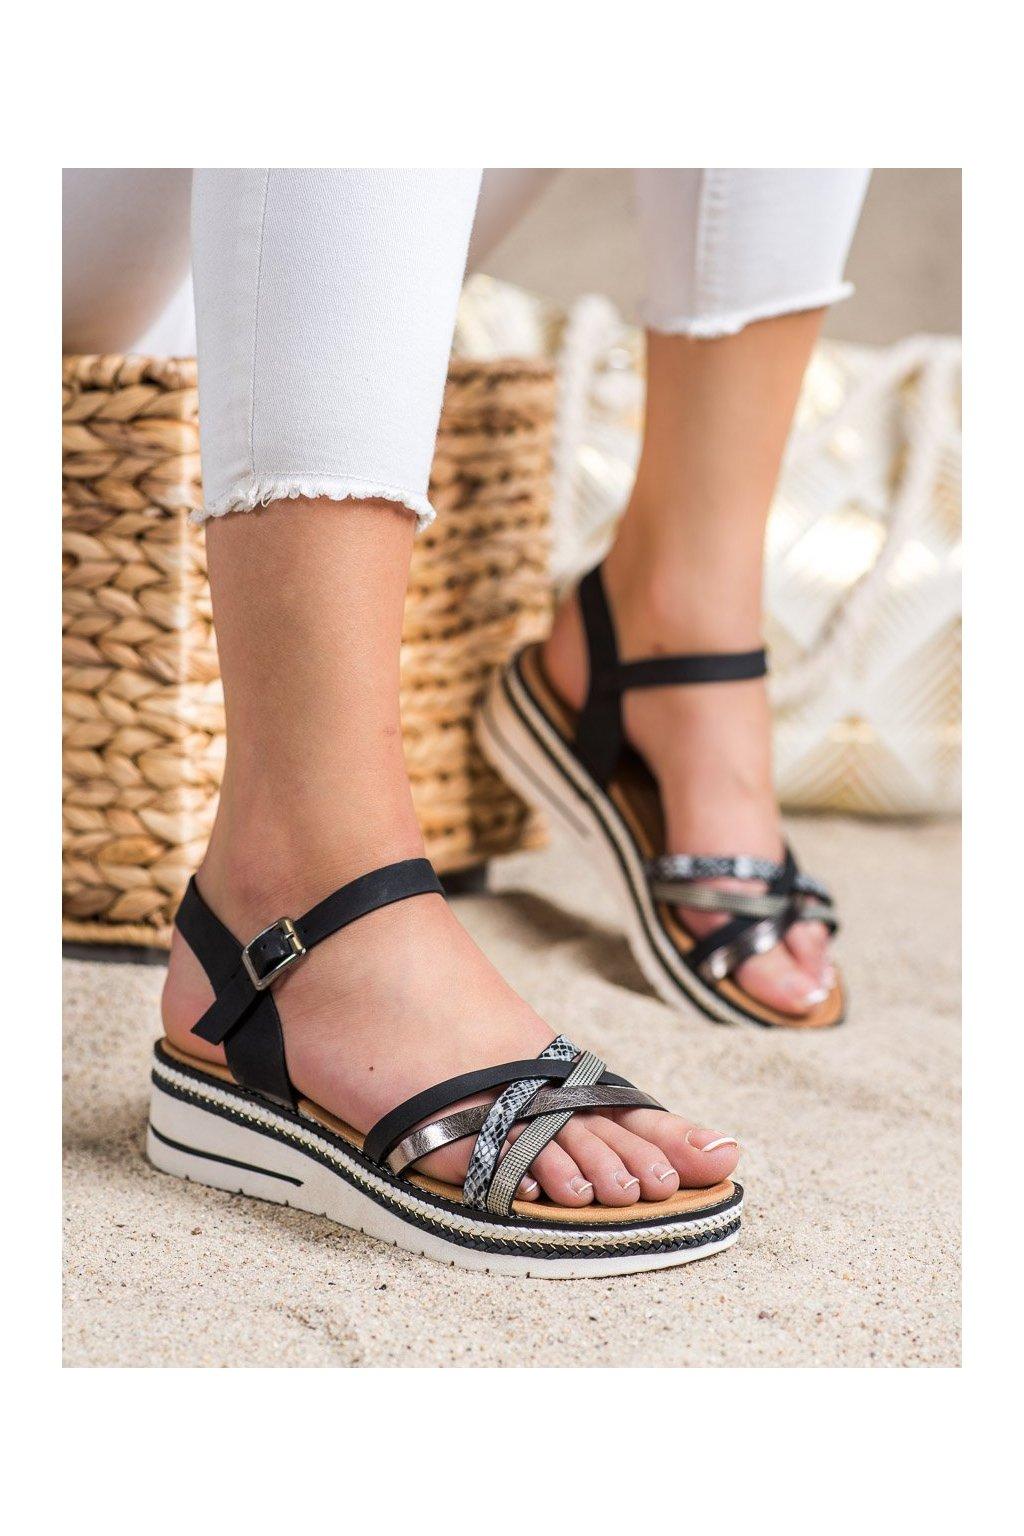 Čierne sandále Groto gogo kod G245B